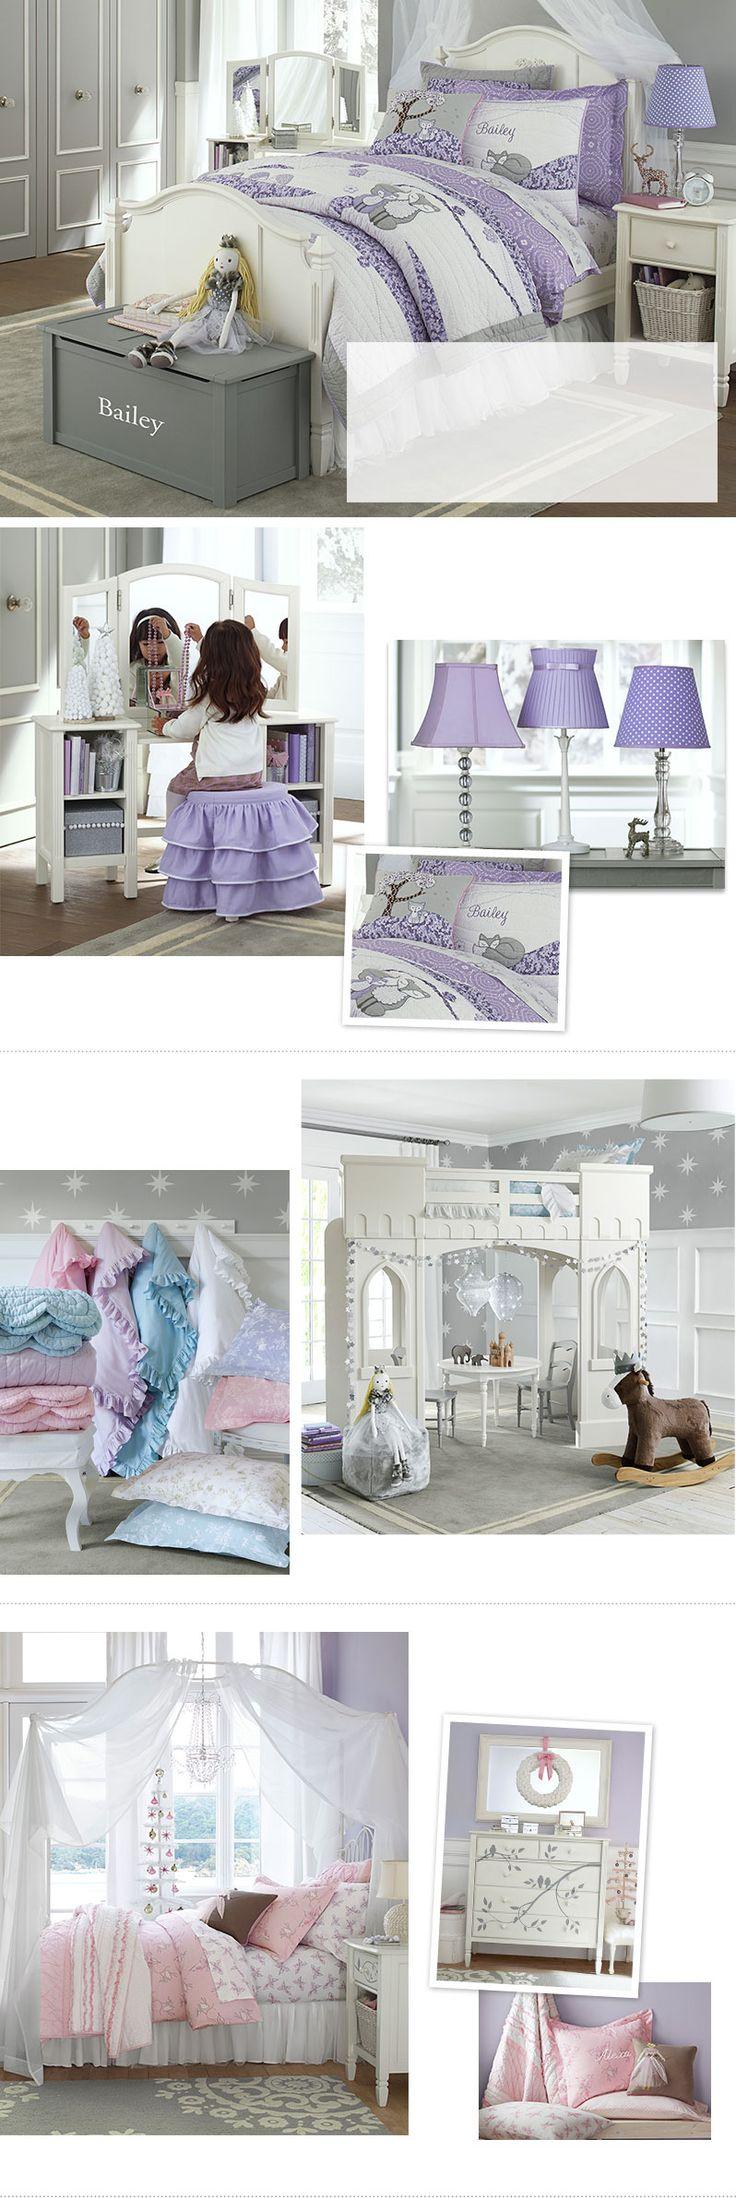 Girls Bedroom Ideas & Girls Room Ideas | Pottery Barn Kids